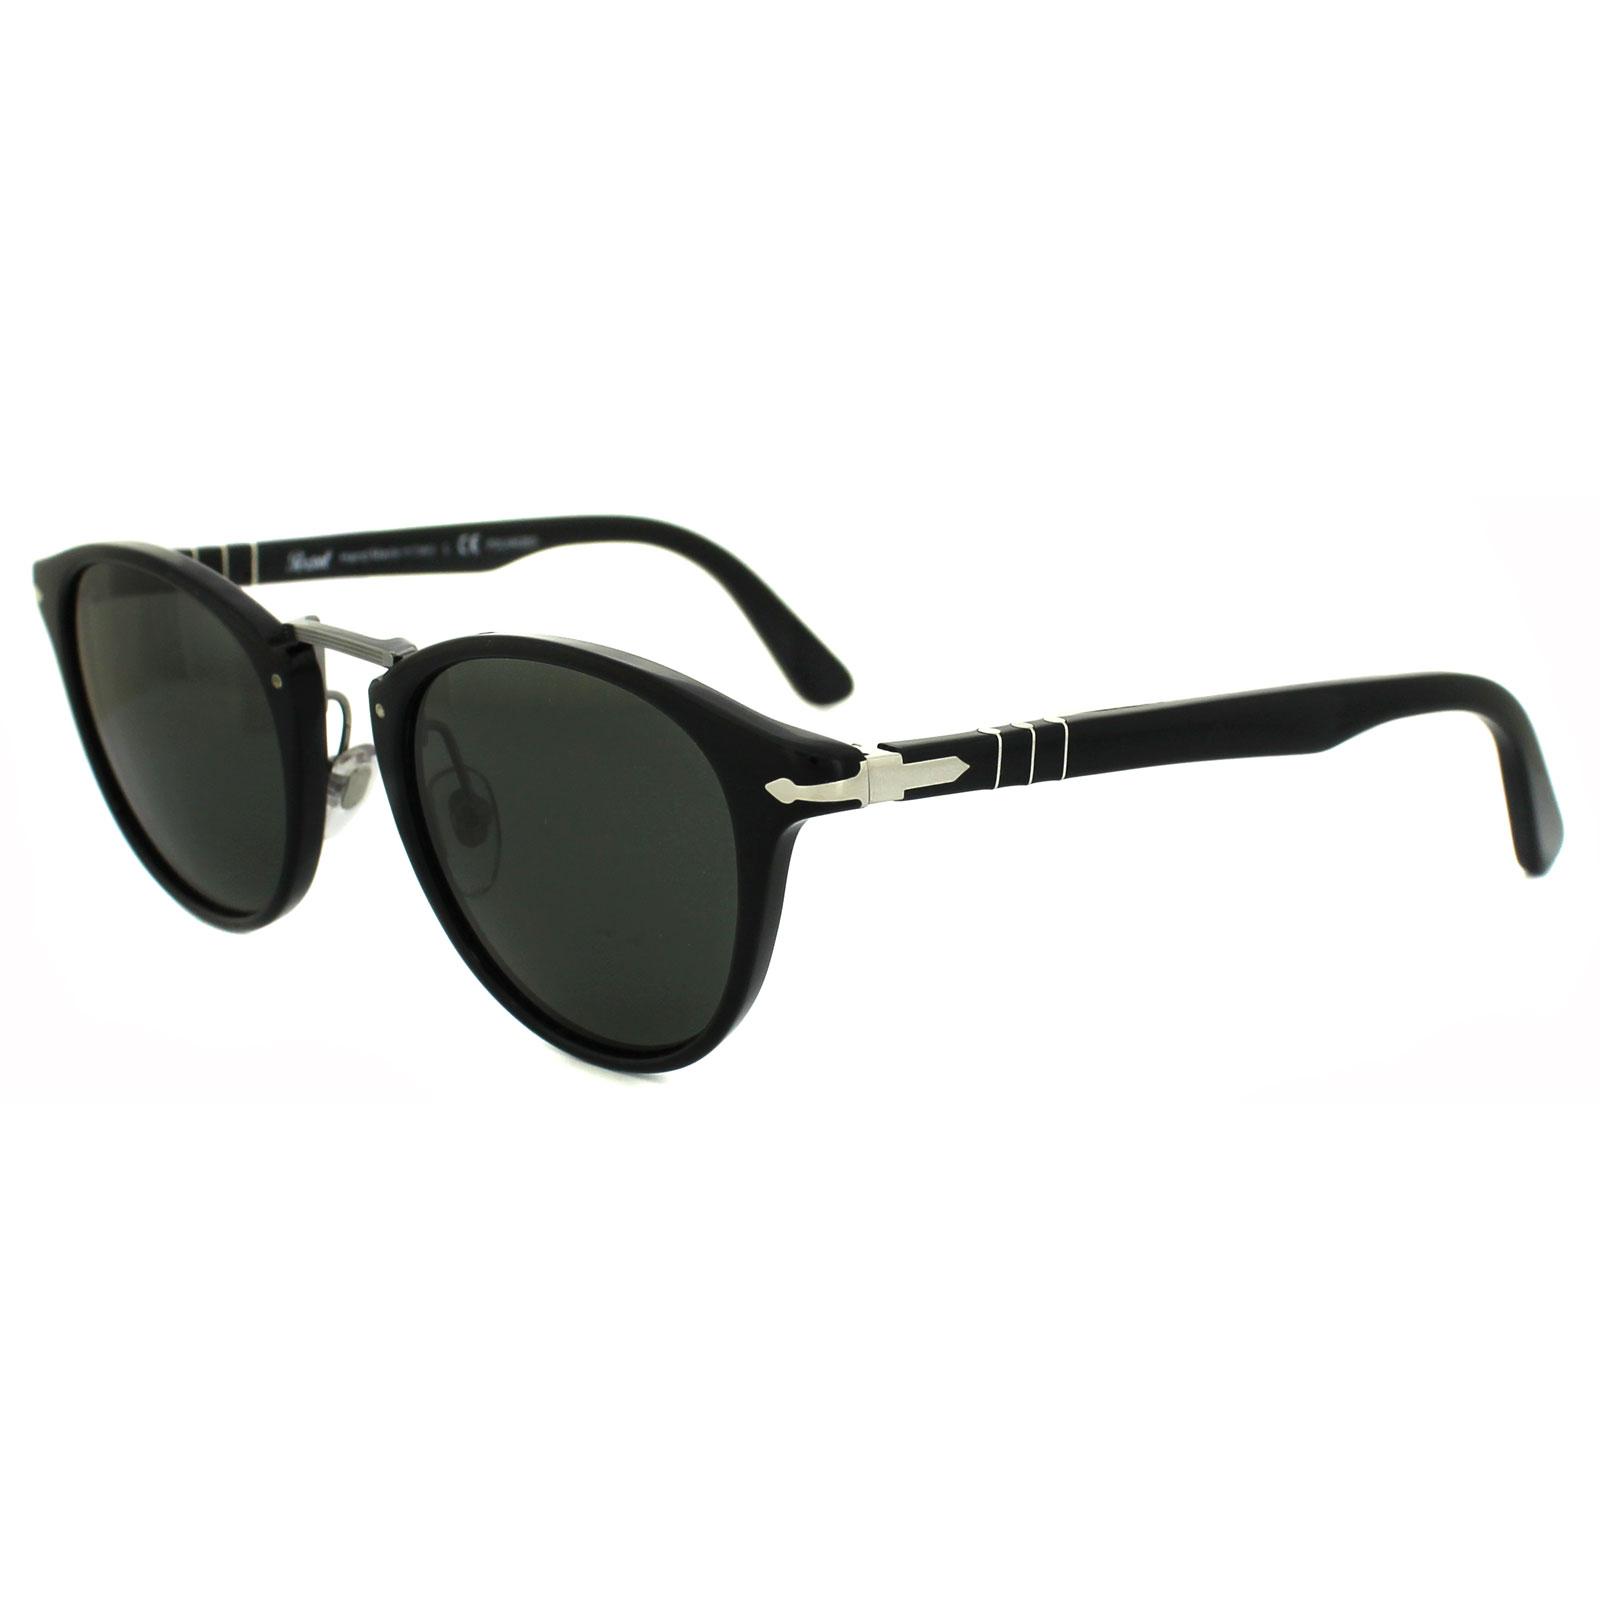 Cheap Persol 3108s Sunglasses Discounted Sunglasses